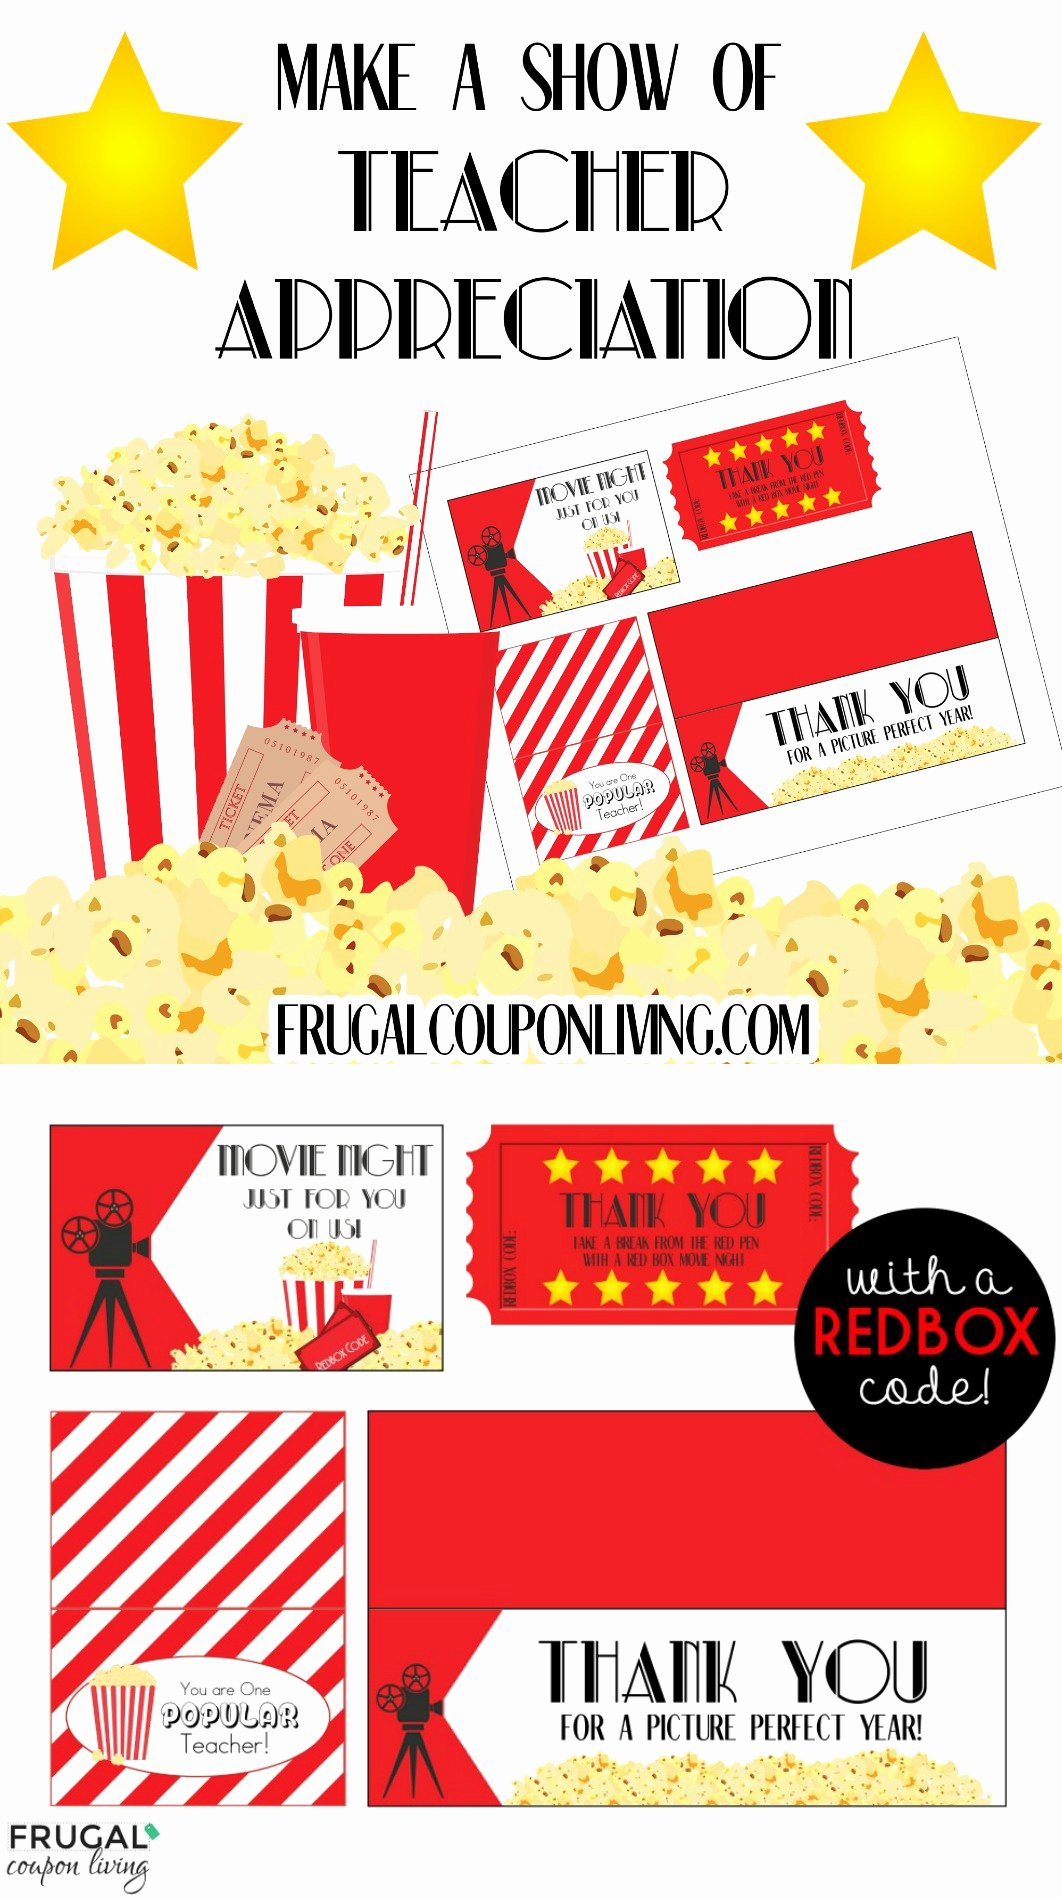 30 Redbox Gift Certificate Template   Pryncepality Intended For Movie Gift Certificate Template